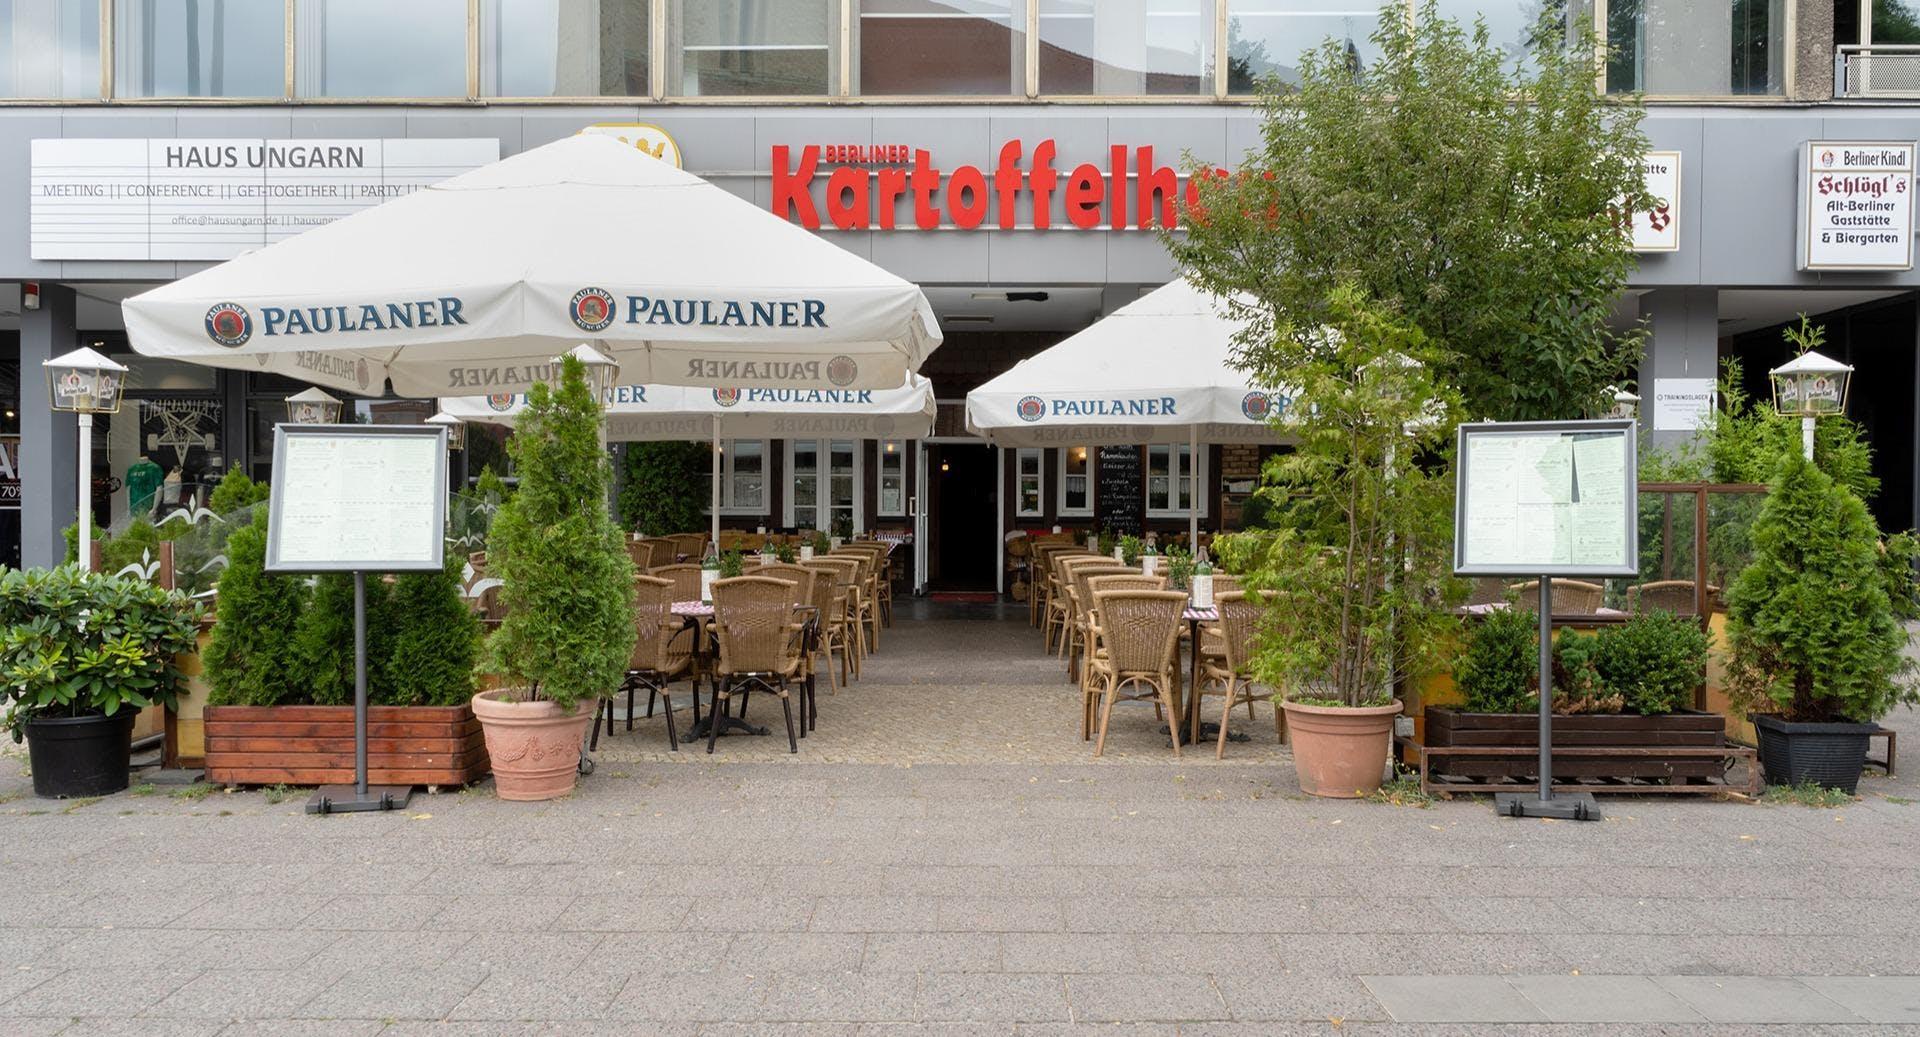 Berliner Kartoffelhaus Berlin image 1